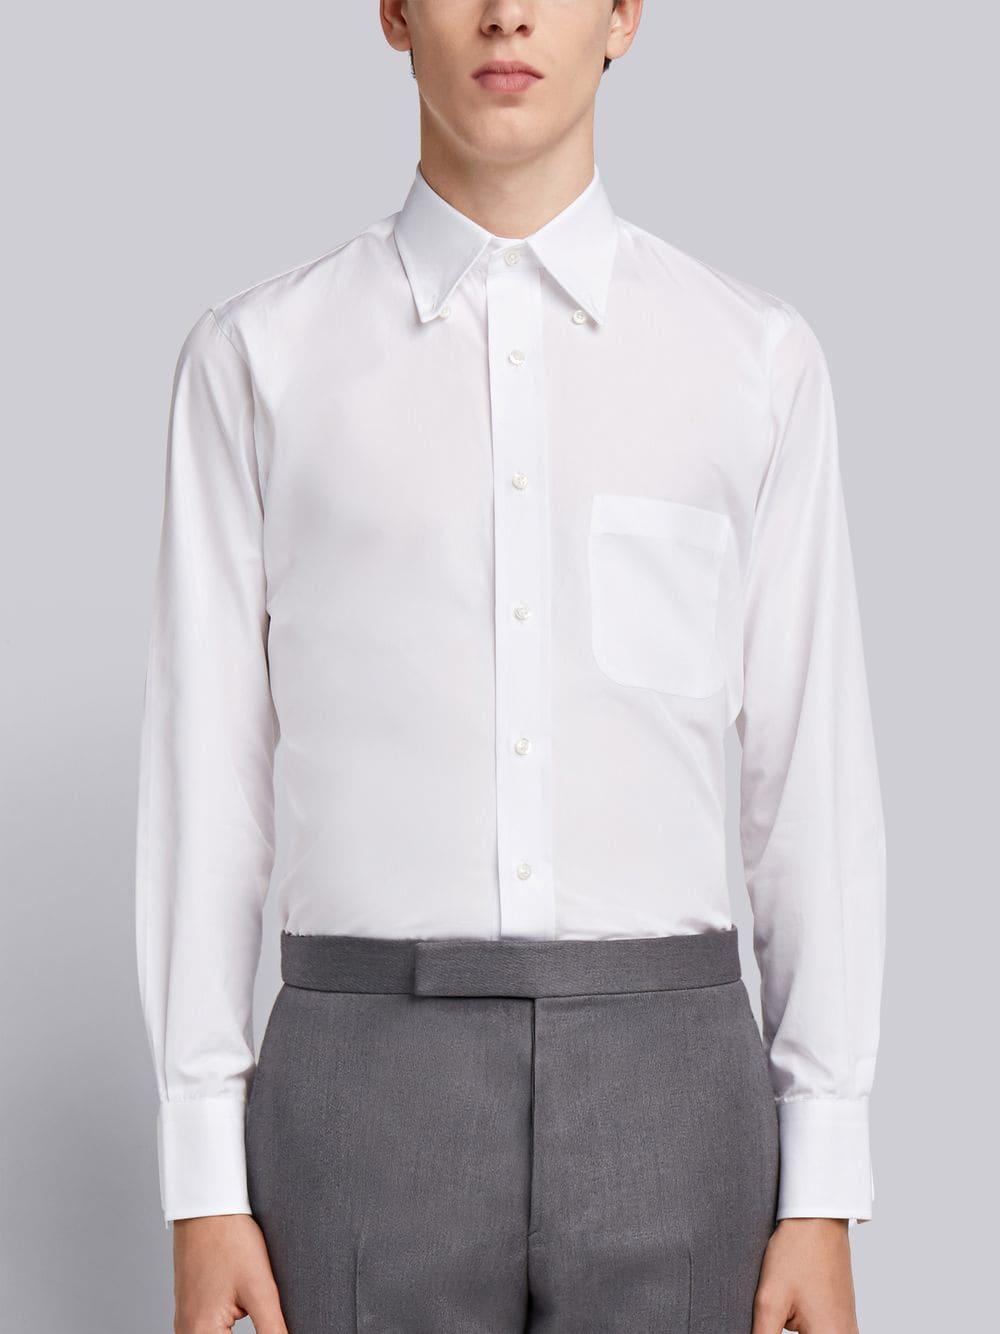 a5142dcf9da Lyst - Thom Browne Solid Poplin Dress Shirt in White for Men